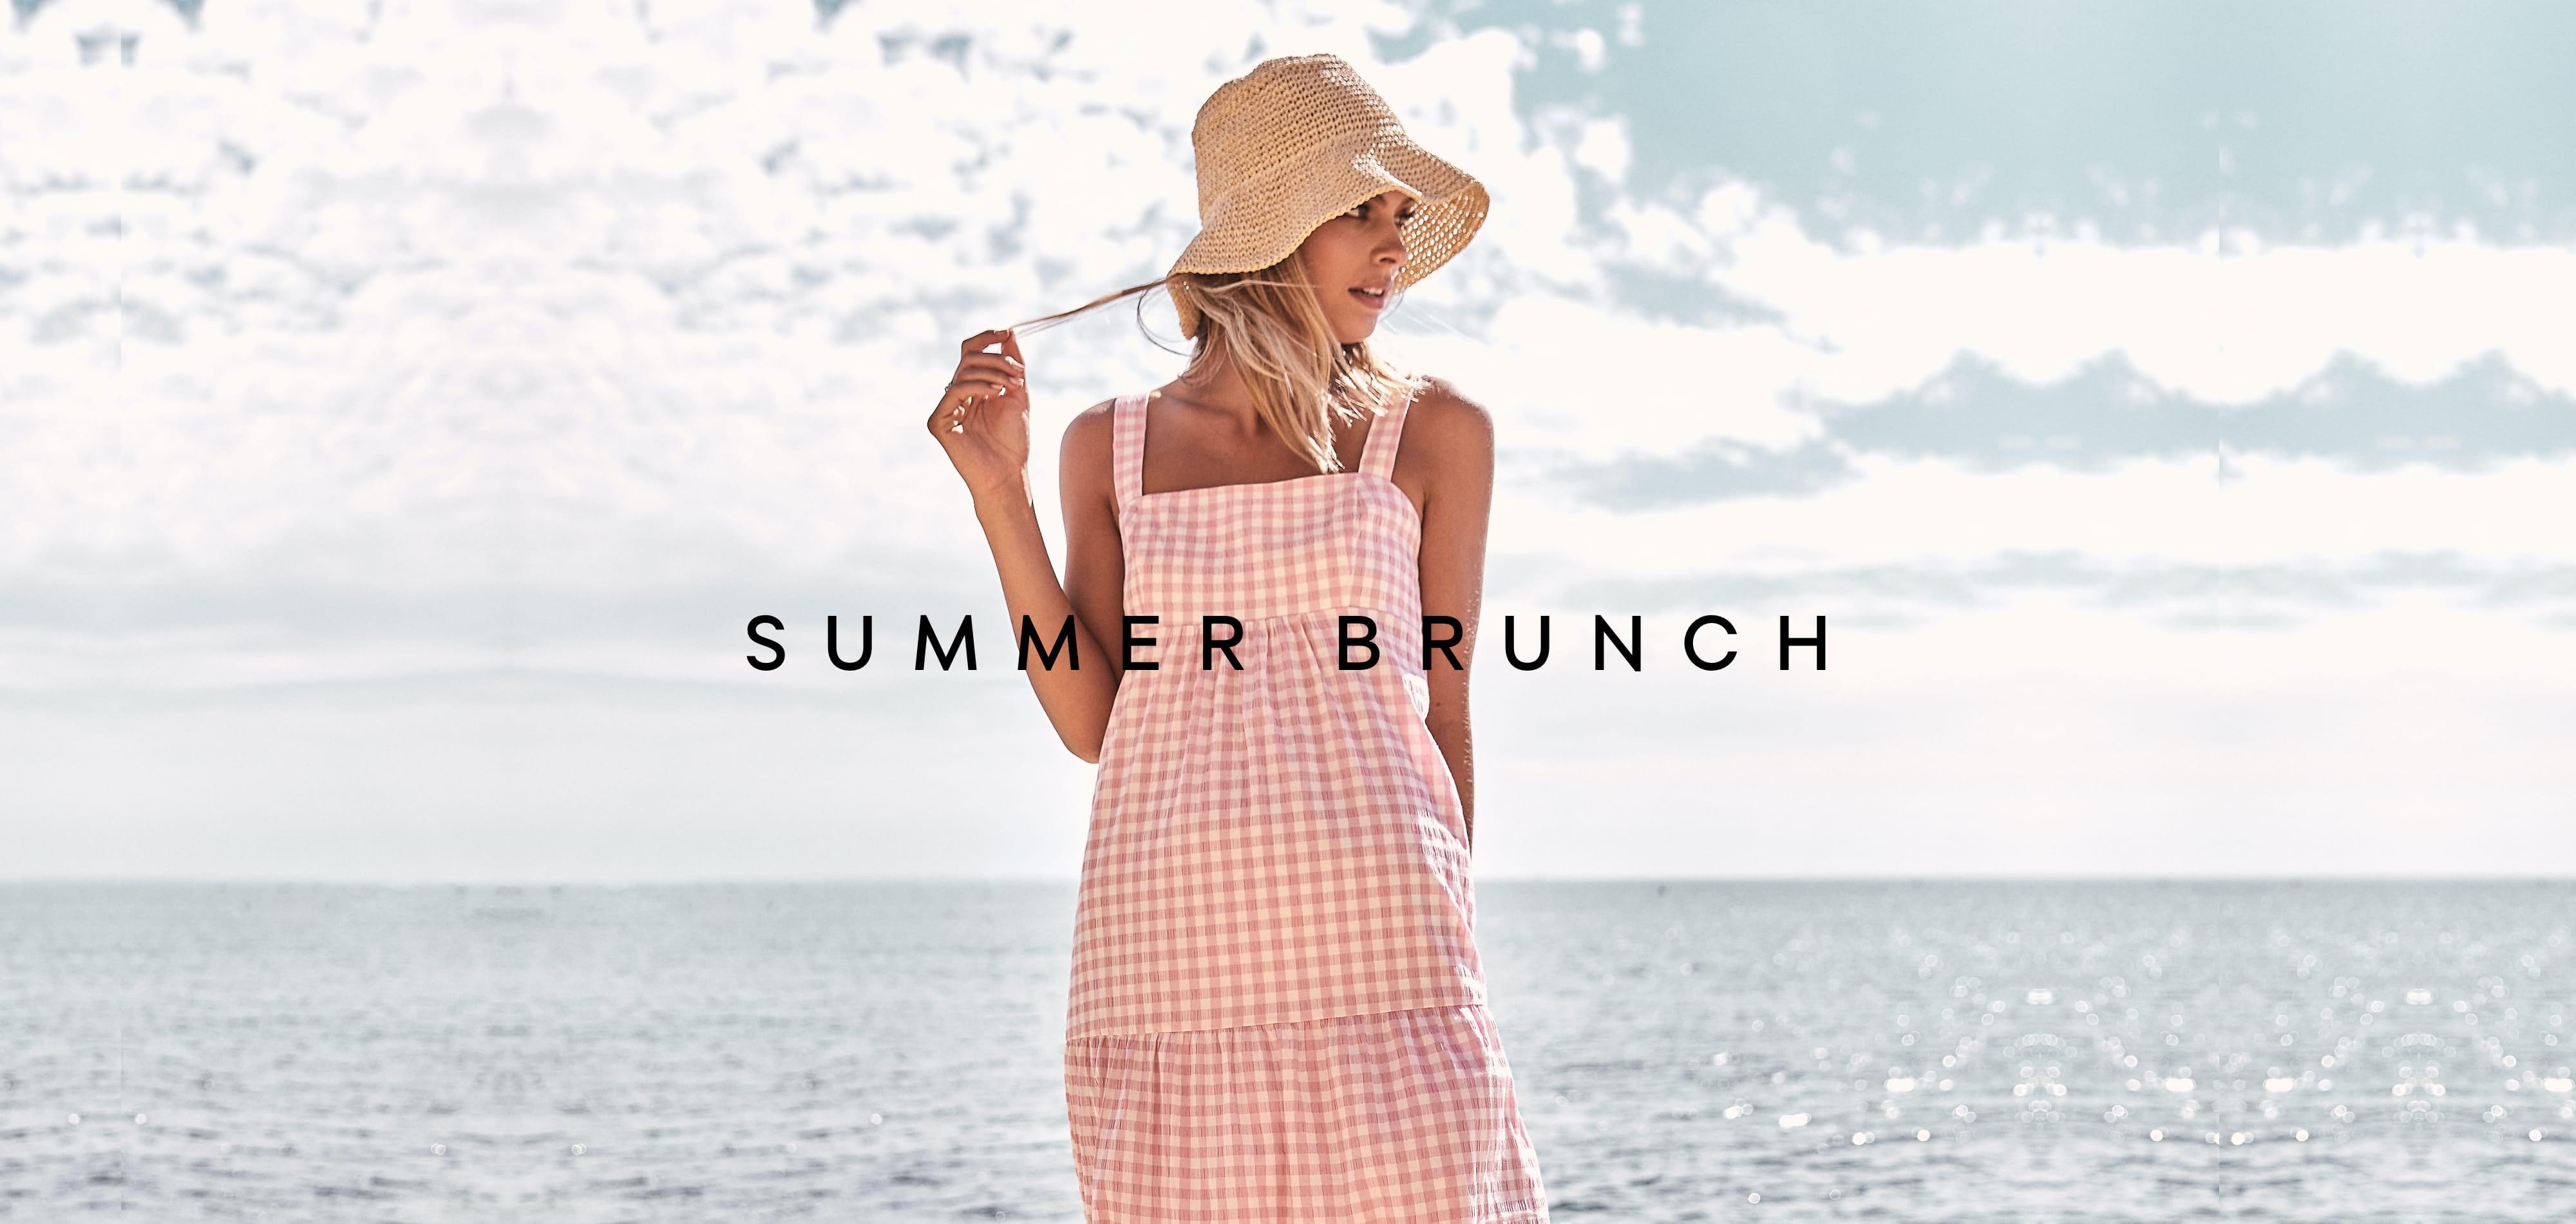 Summer Brunch Outfits